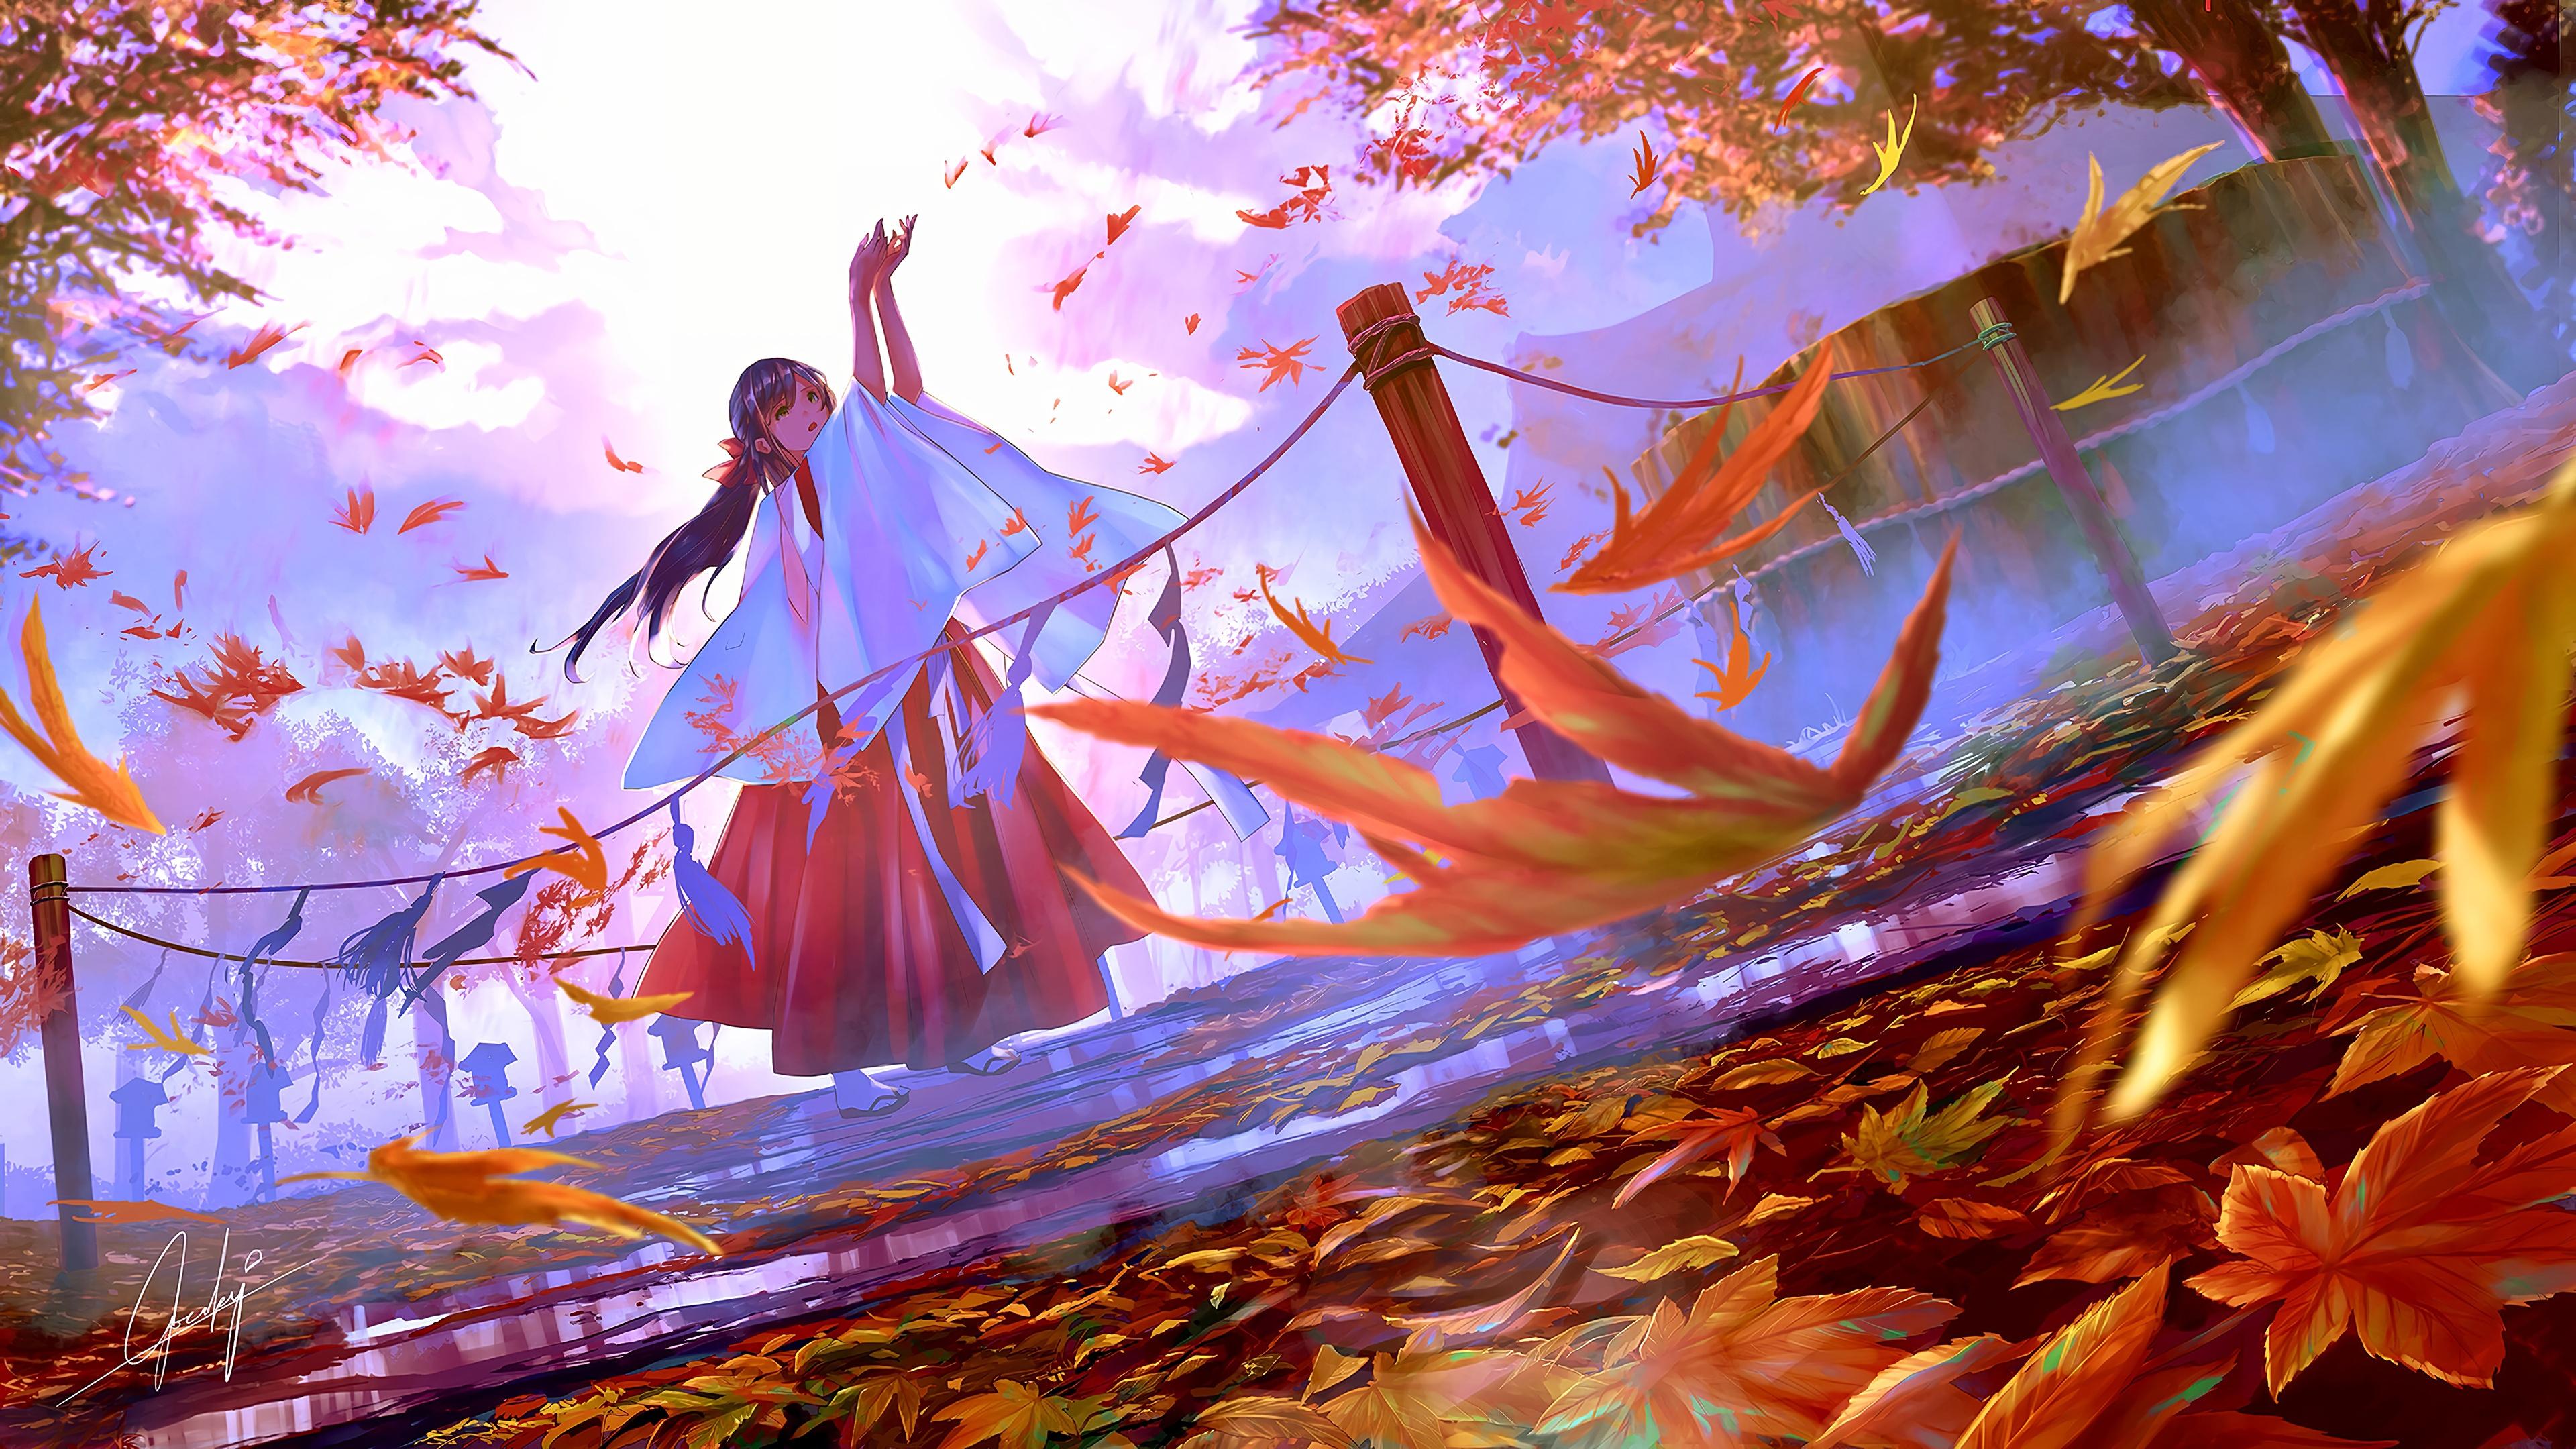 Fall Art 3840x2160 wallpaper